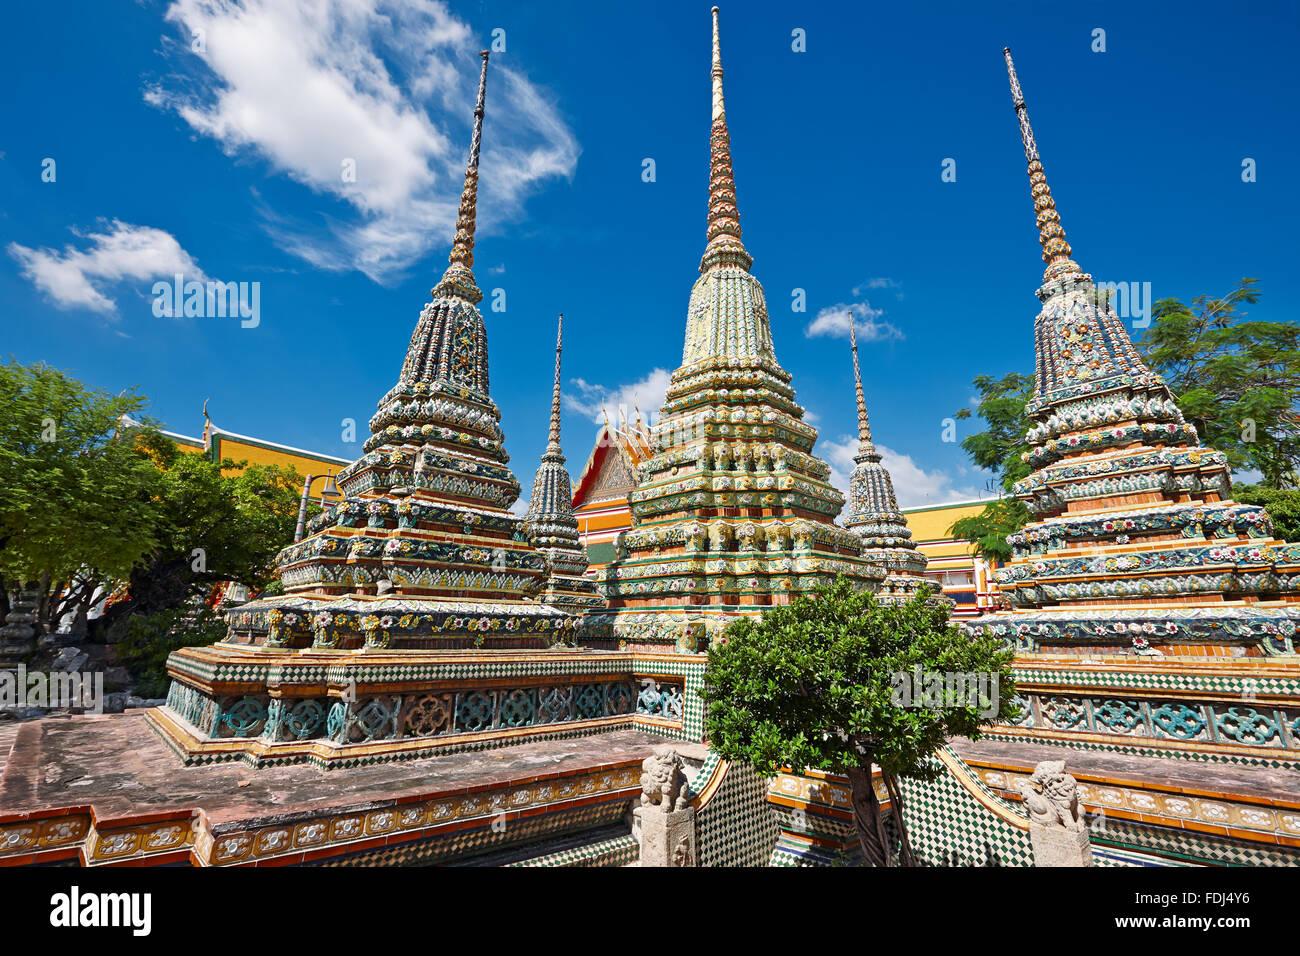 Pagodas of the Wat Pho Temple, Bangkok, Thailand. - Stock Image